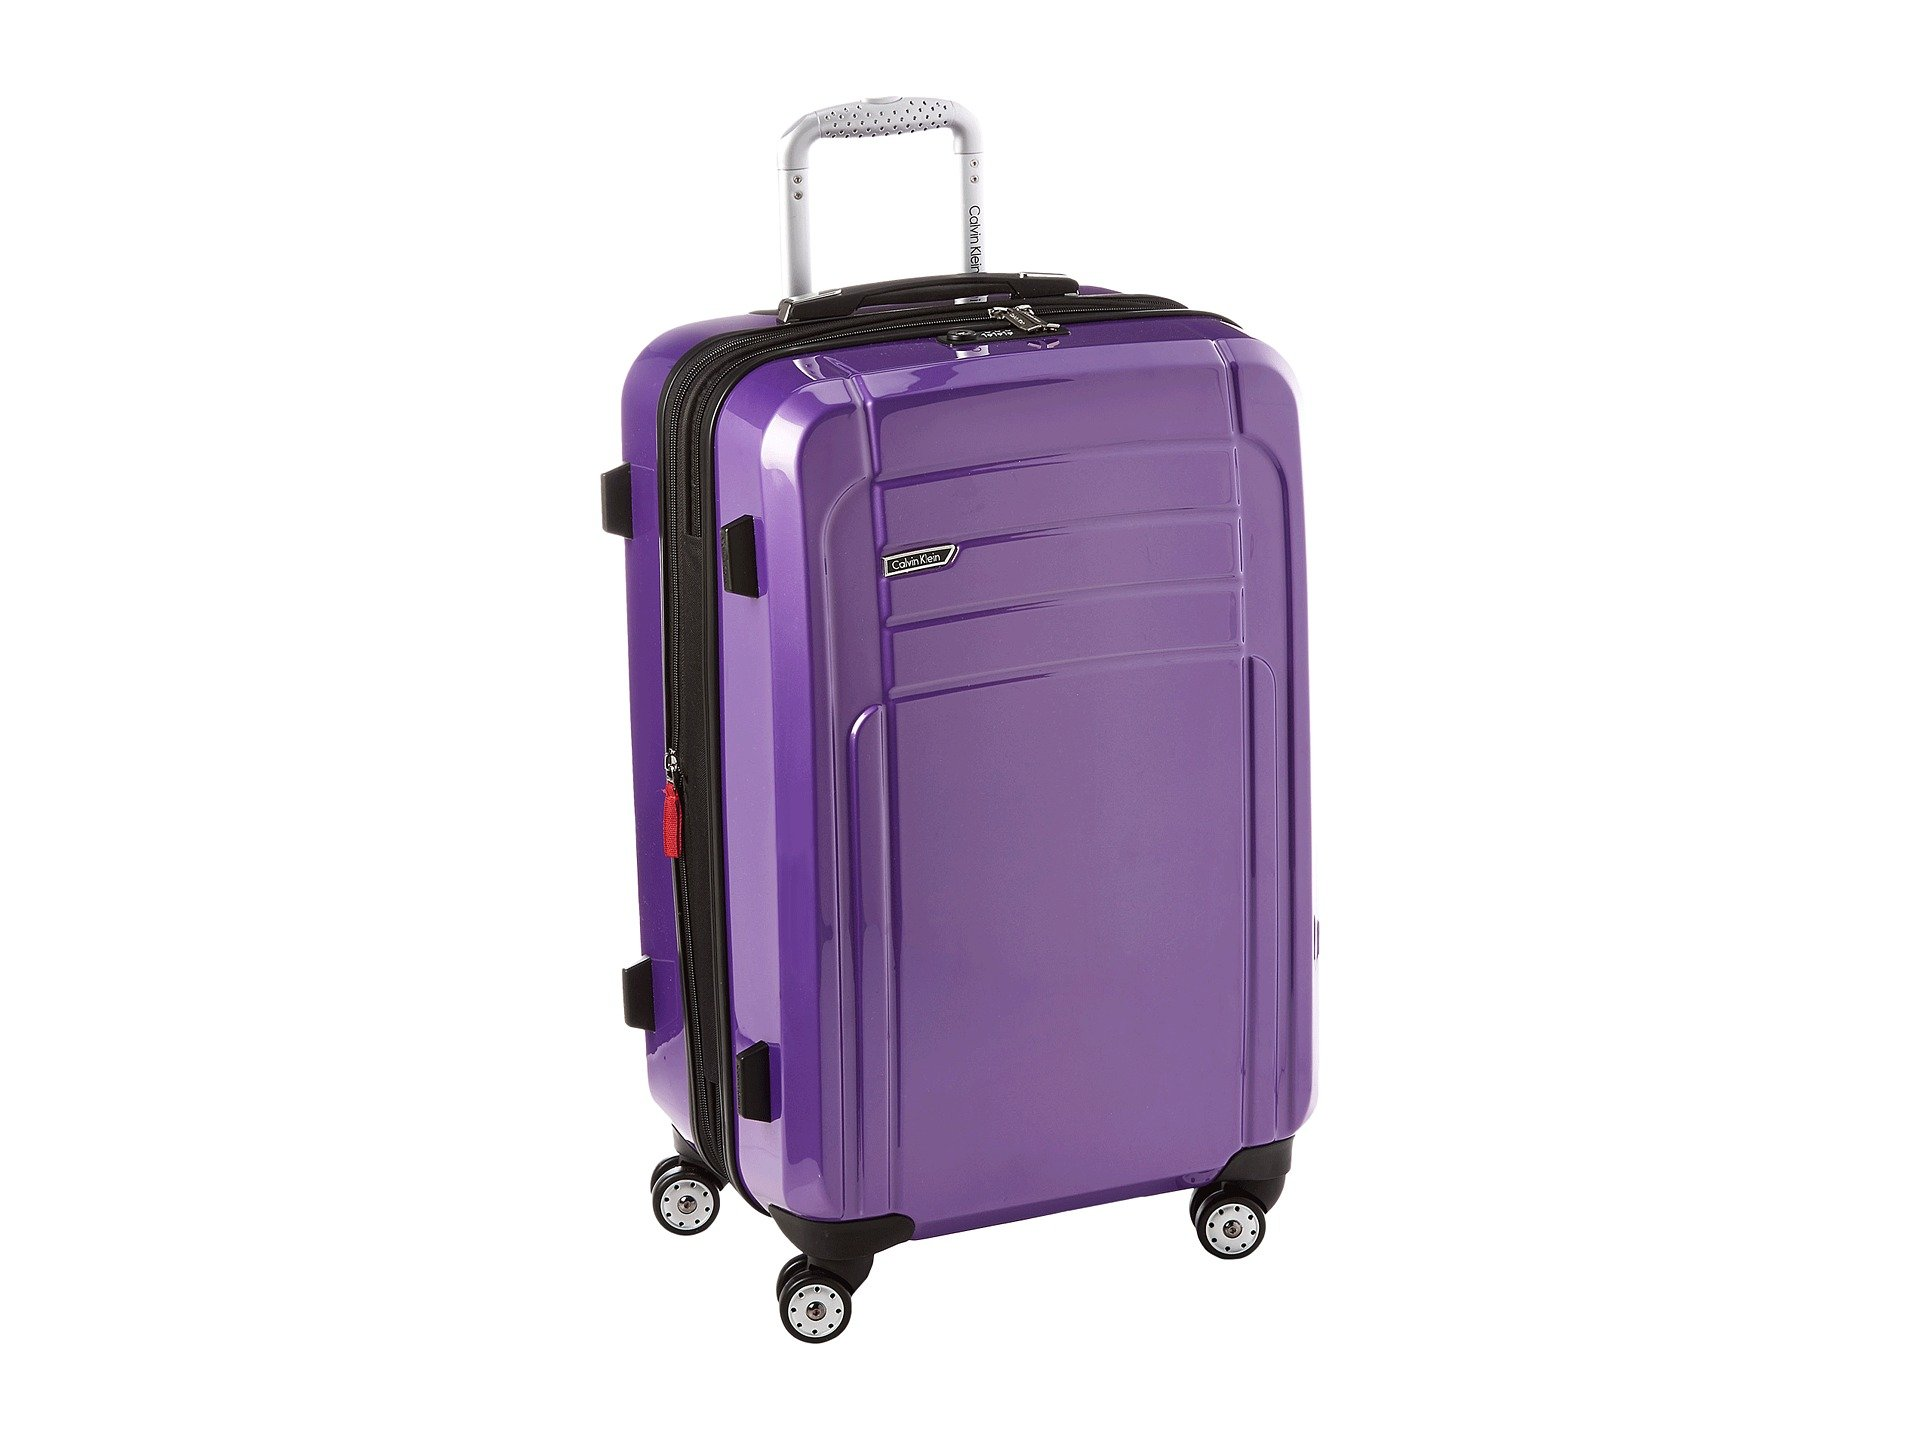 "Rome 25"" Upright Suitcase"